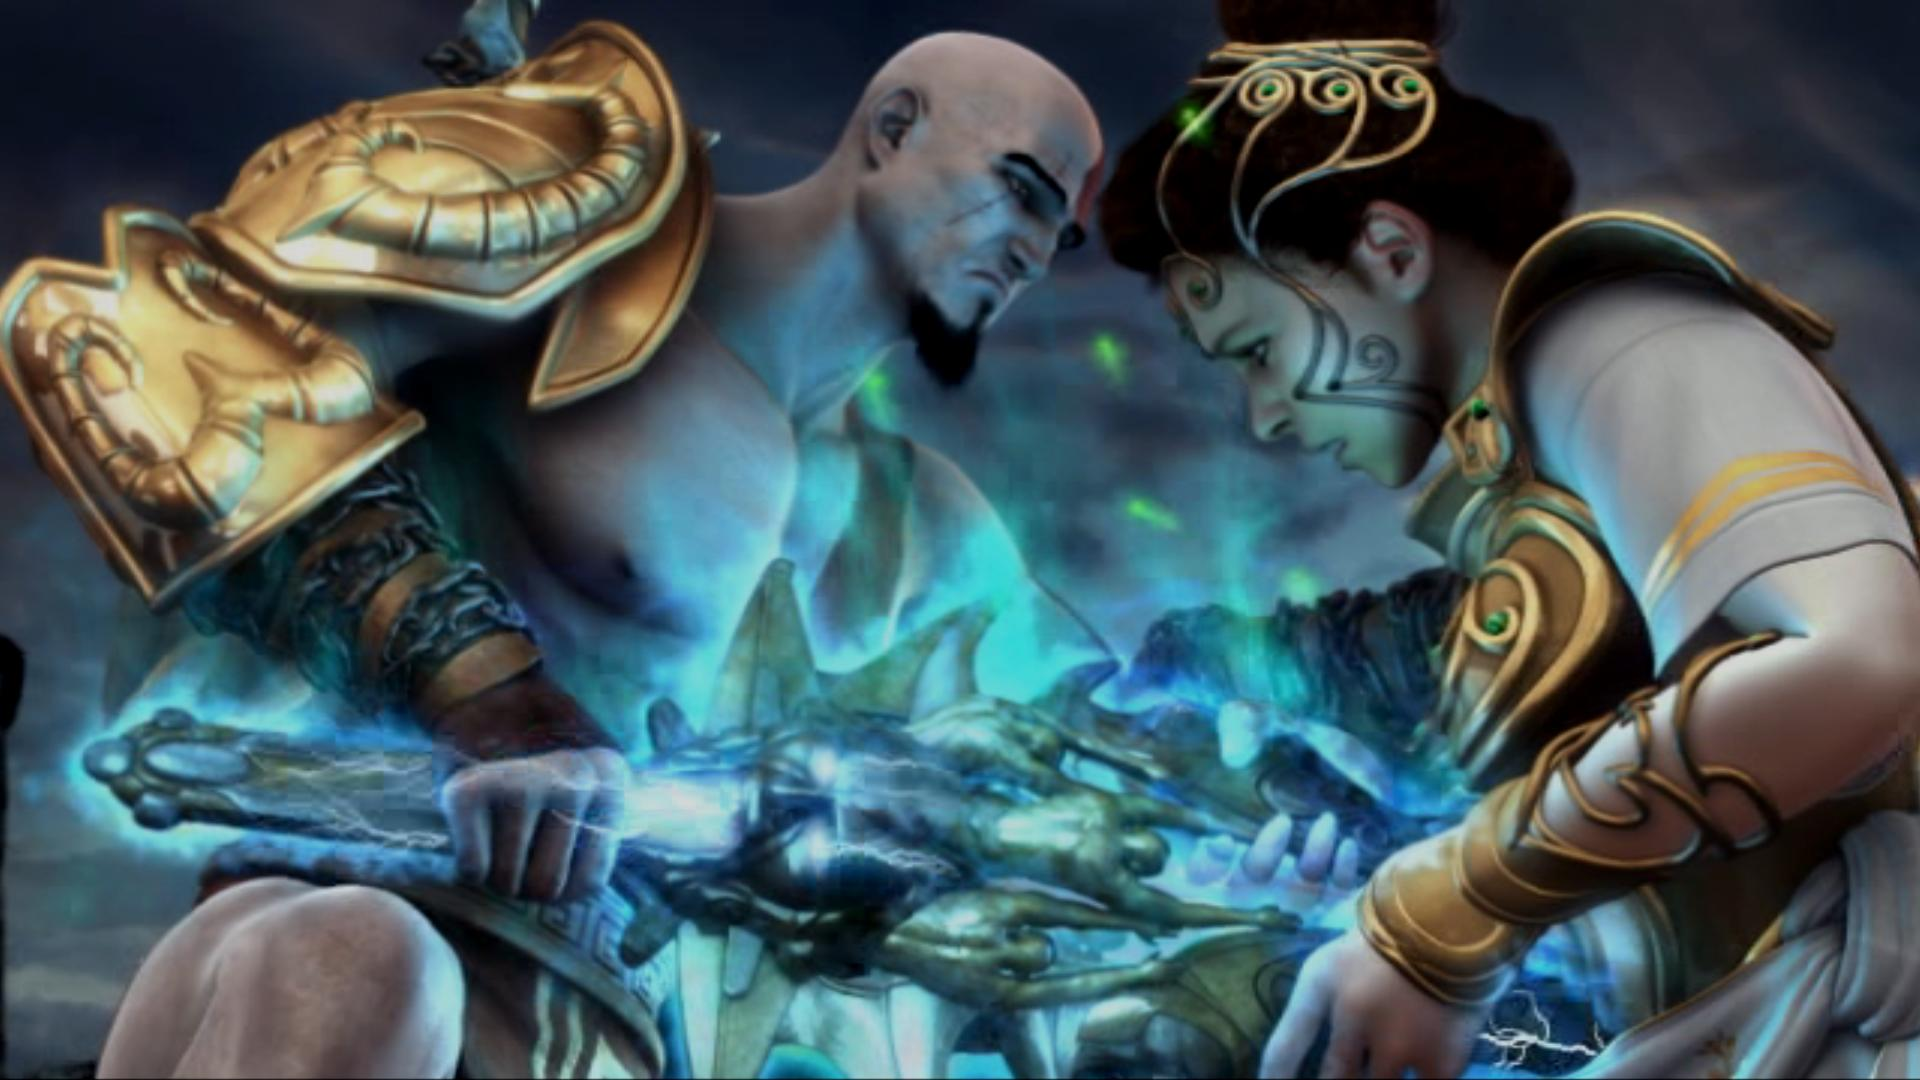 pcsx2beta13292009061013f تاریخچه خدای جنگ | قسمت چهارم: پایان آغازی بزرگ